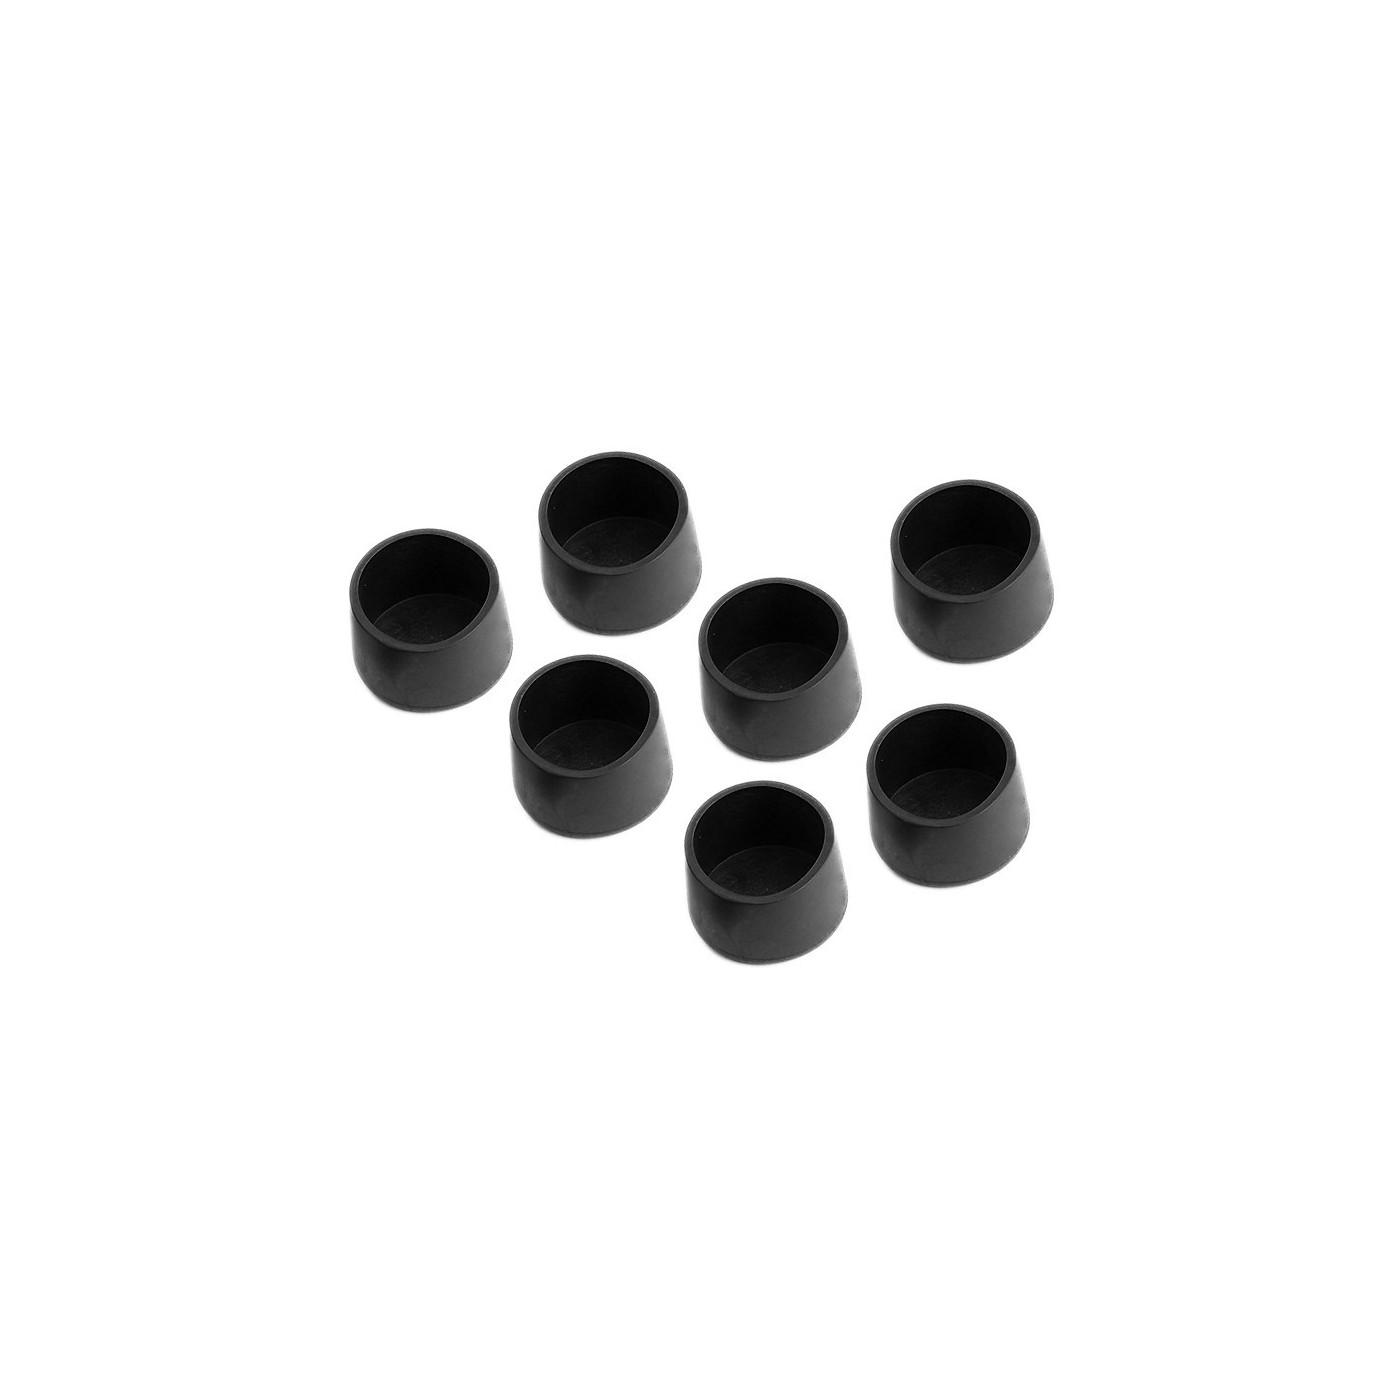 Set of 32 silicone chair leg caps (outside, round, 35 mm, black) [O-RO-35-B]  - 1